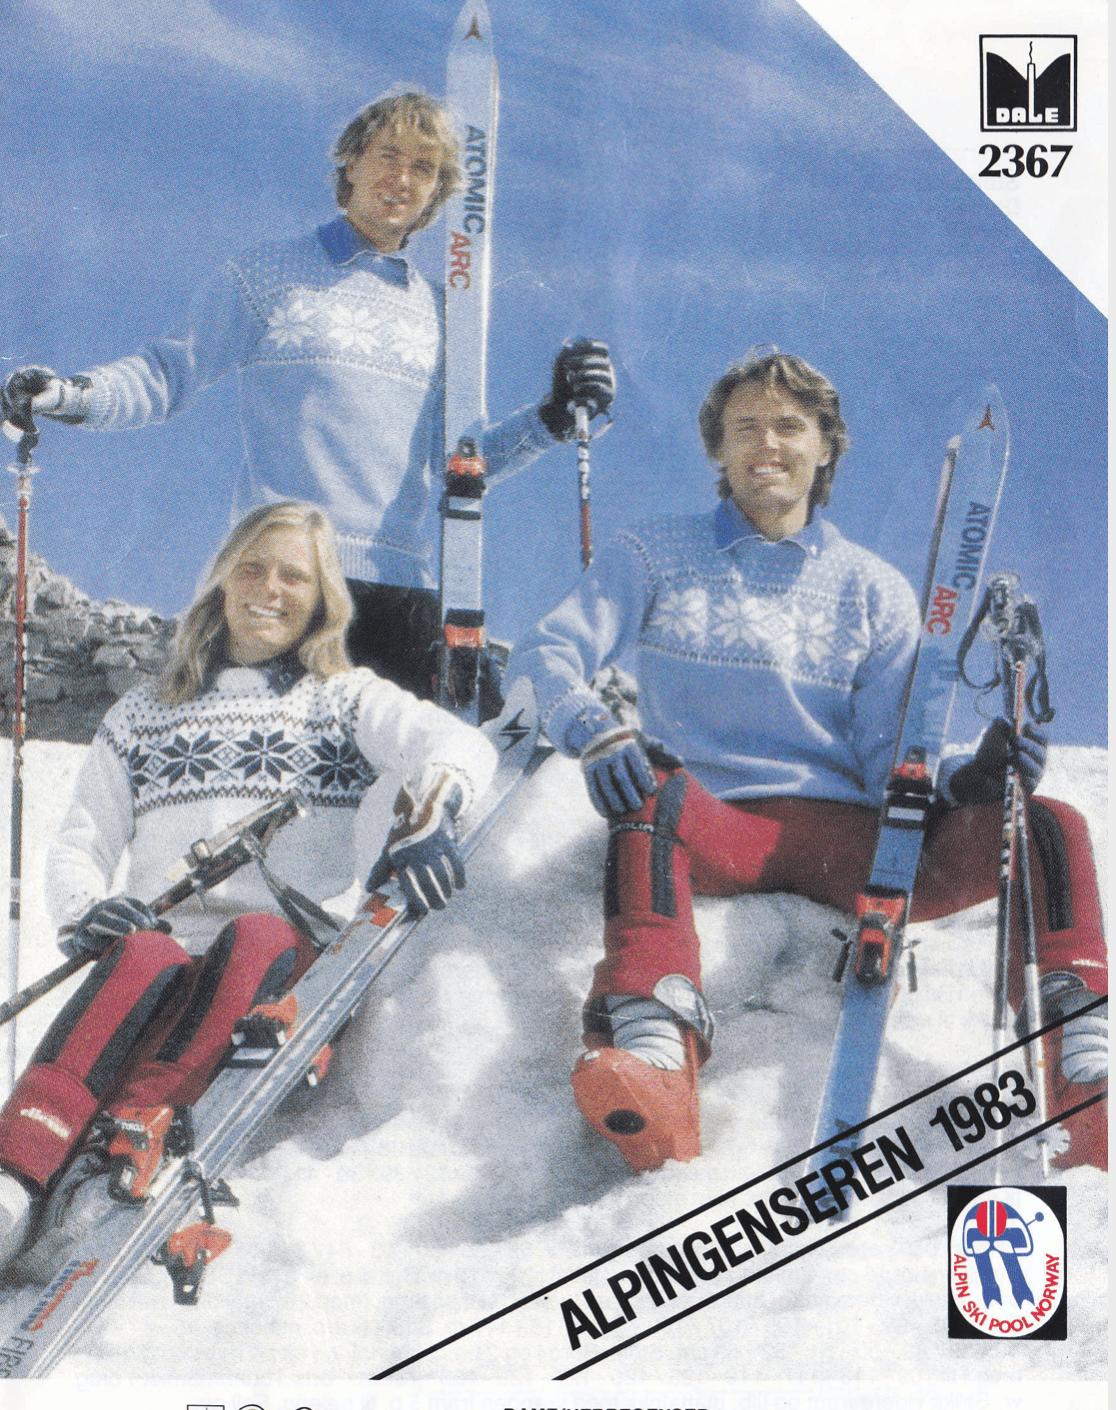 Dale 2367 VM Alpint 1983